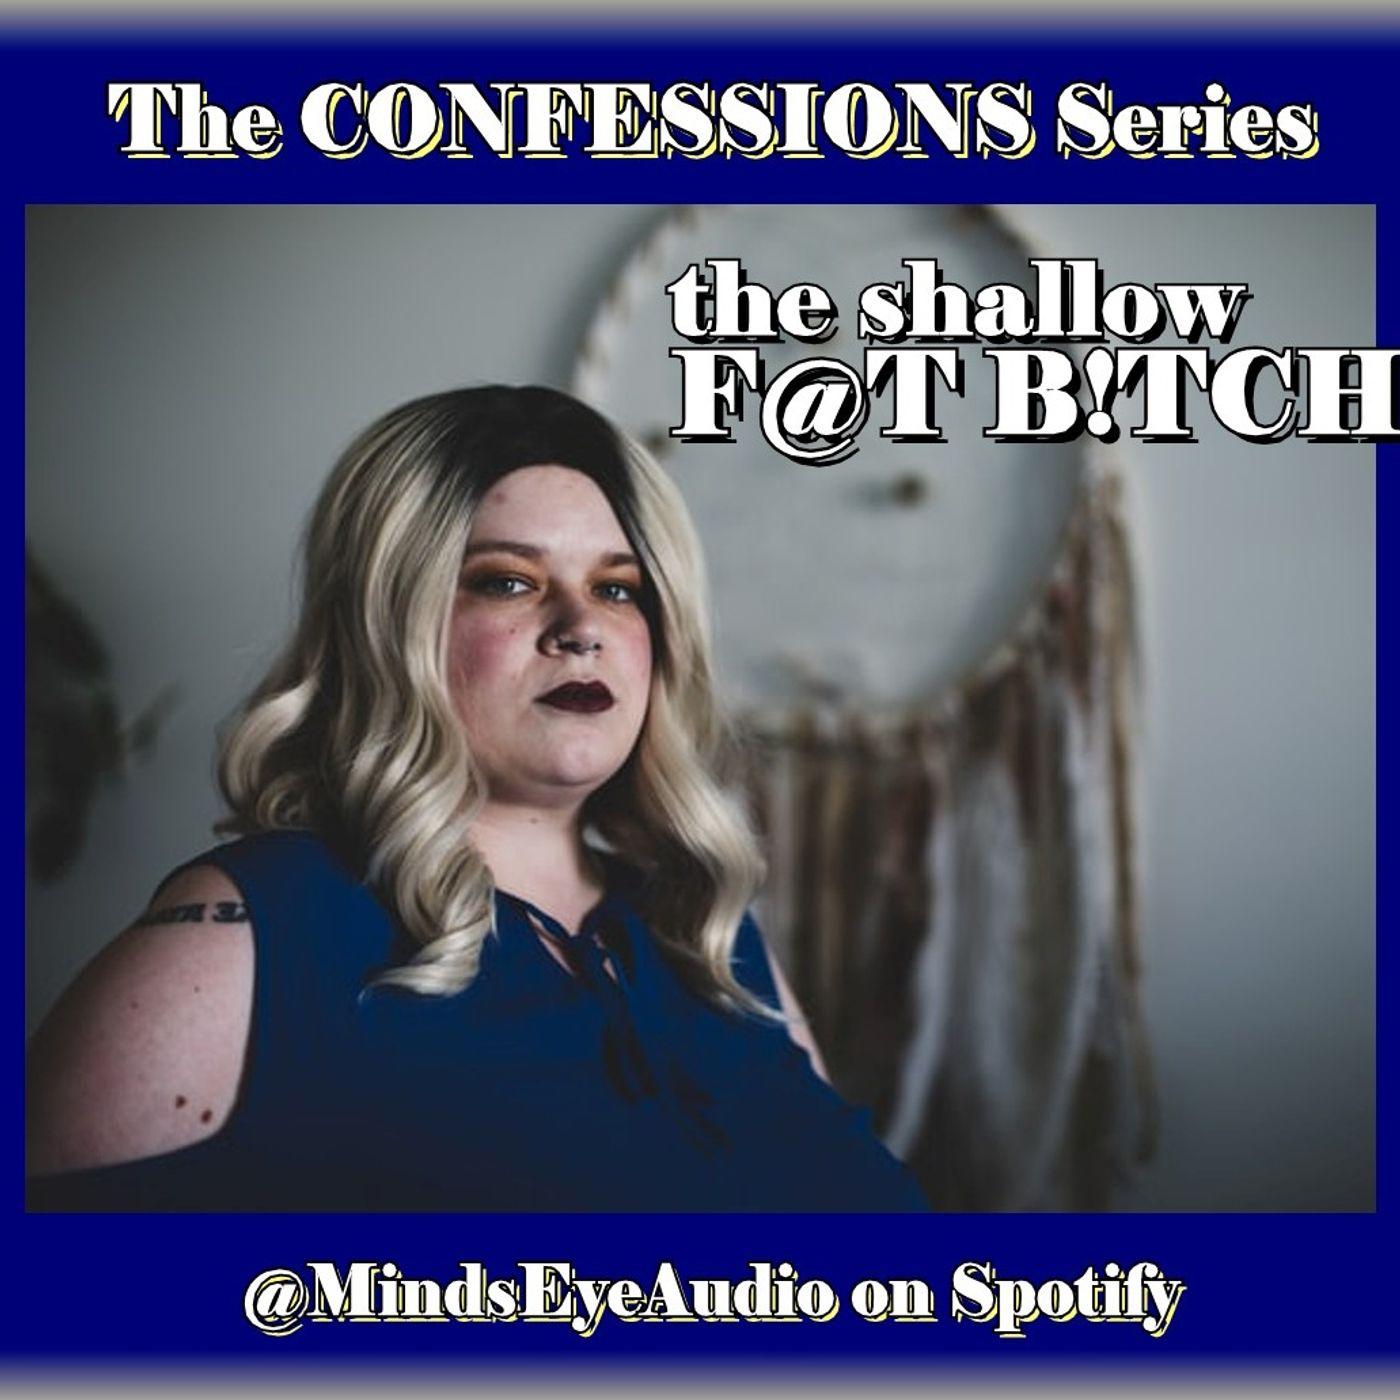 Confessions EP5 Shallow F@T B!TCH